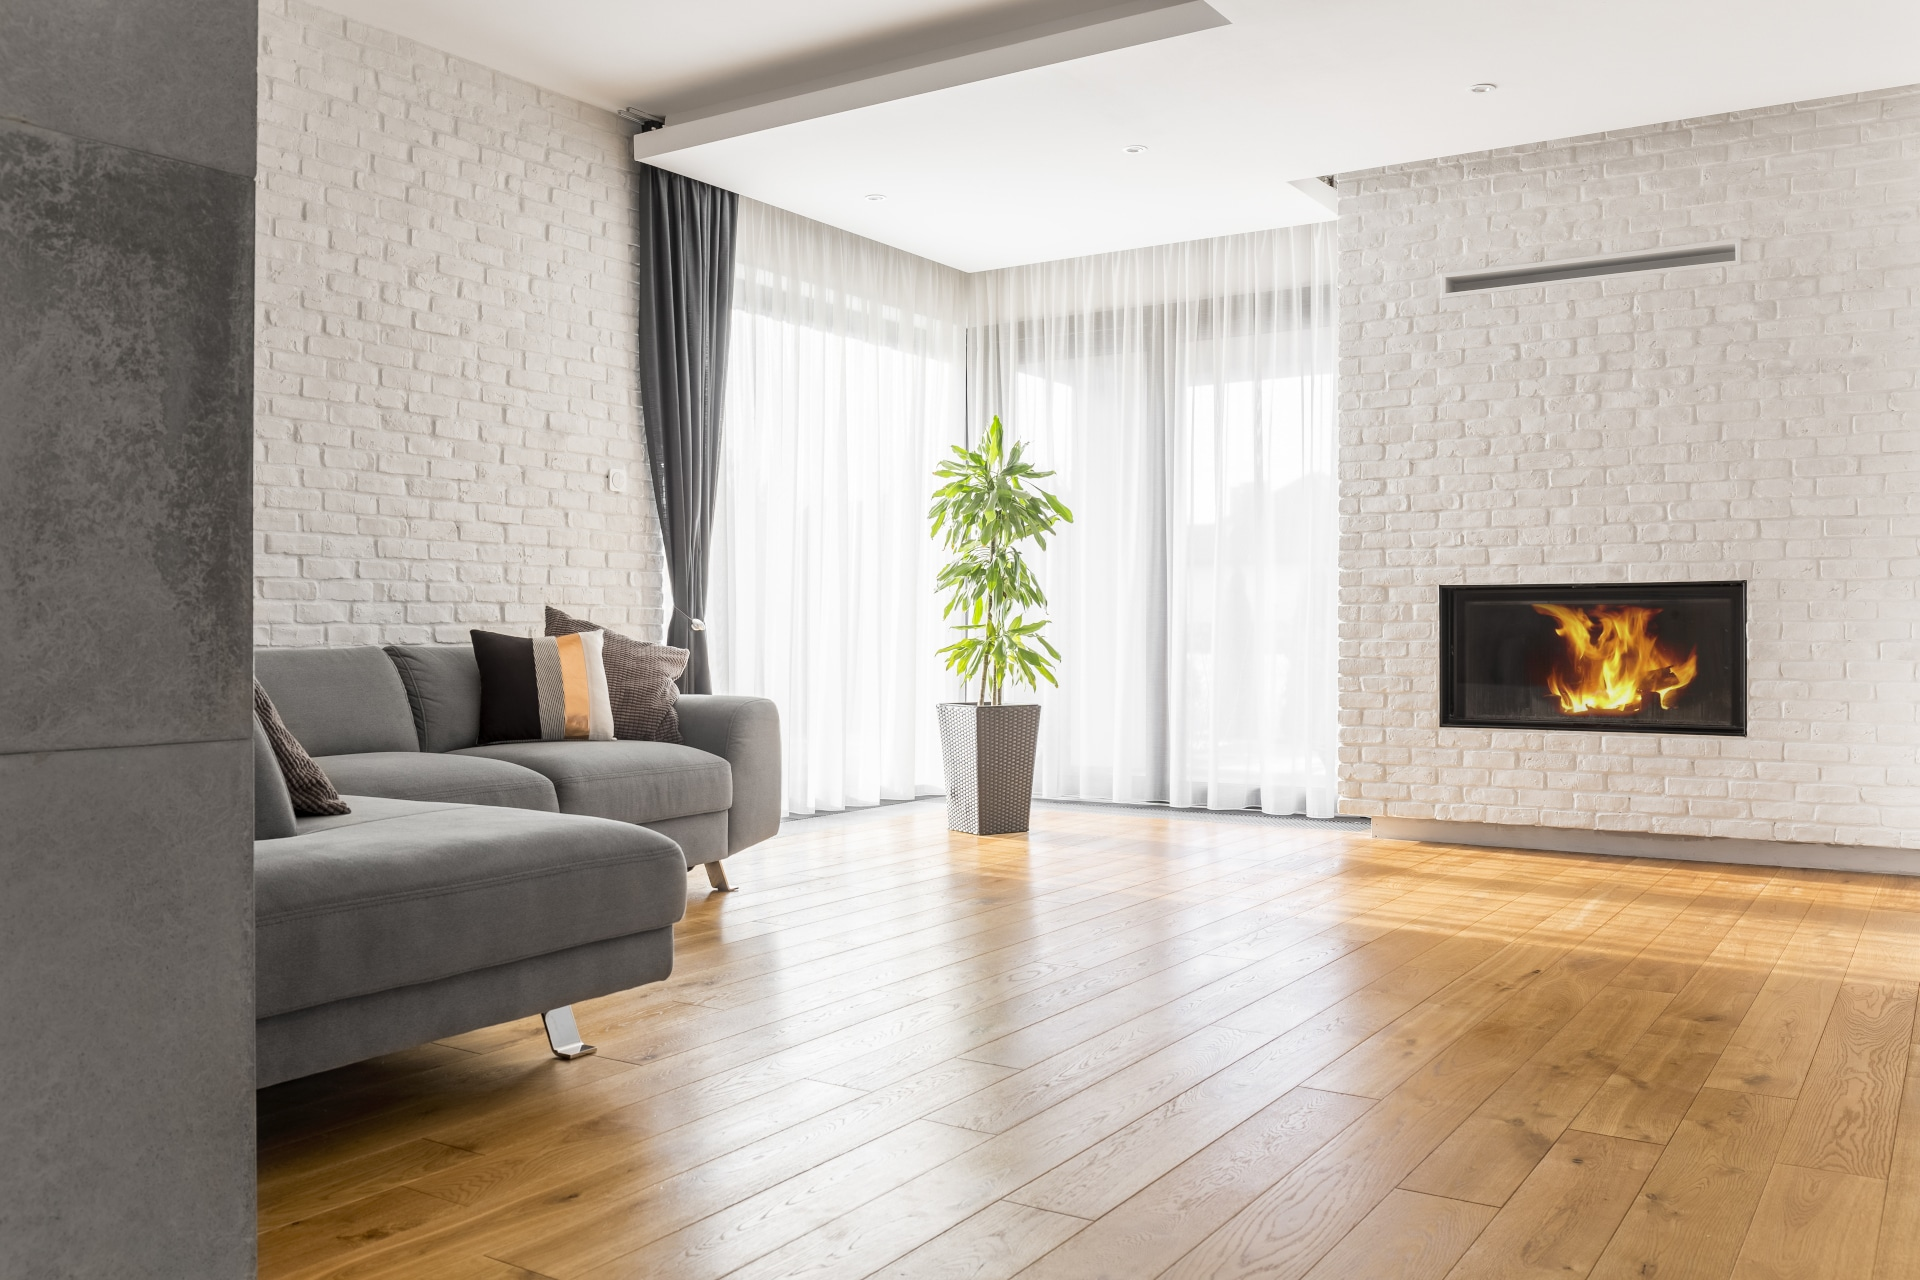 living room with wood flooring PU62LS7